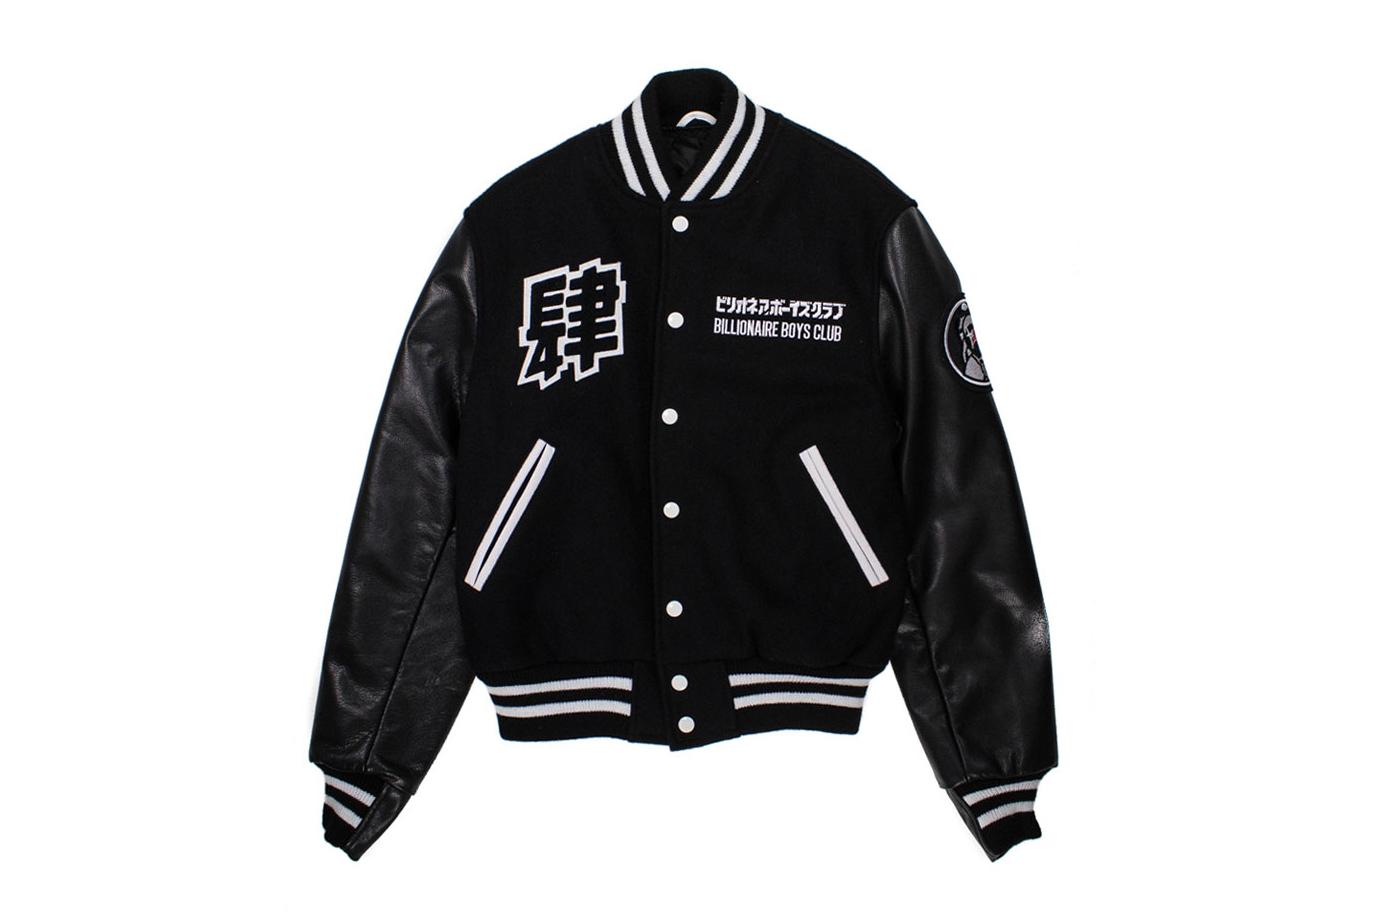 Billionaire Boys Club Holiday Exclusive Varsity Jacket